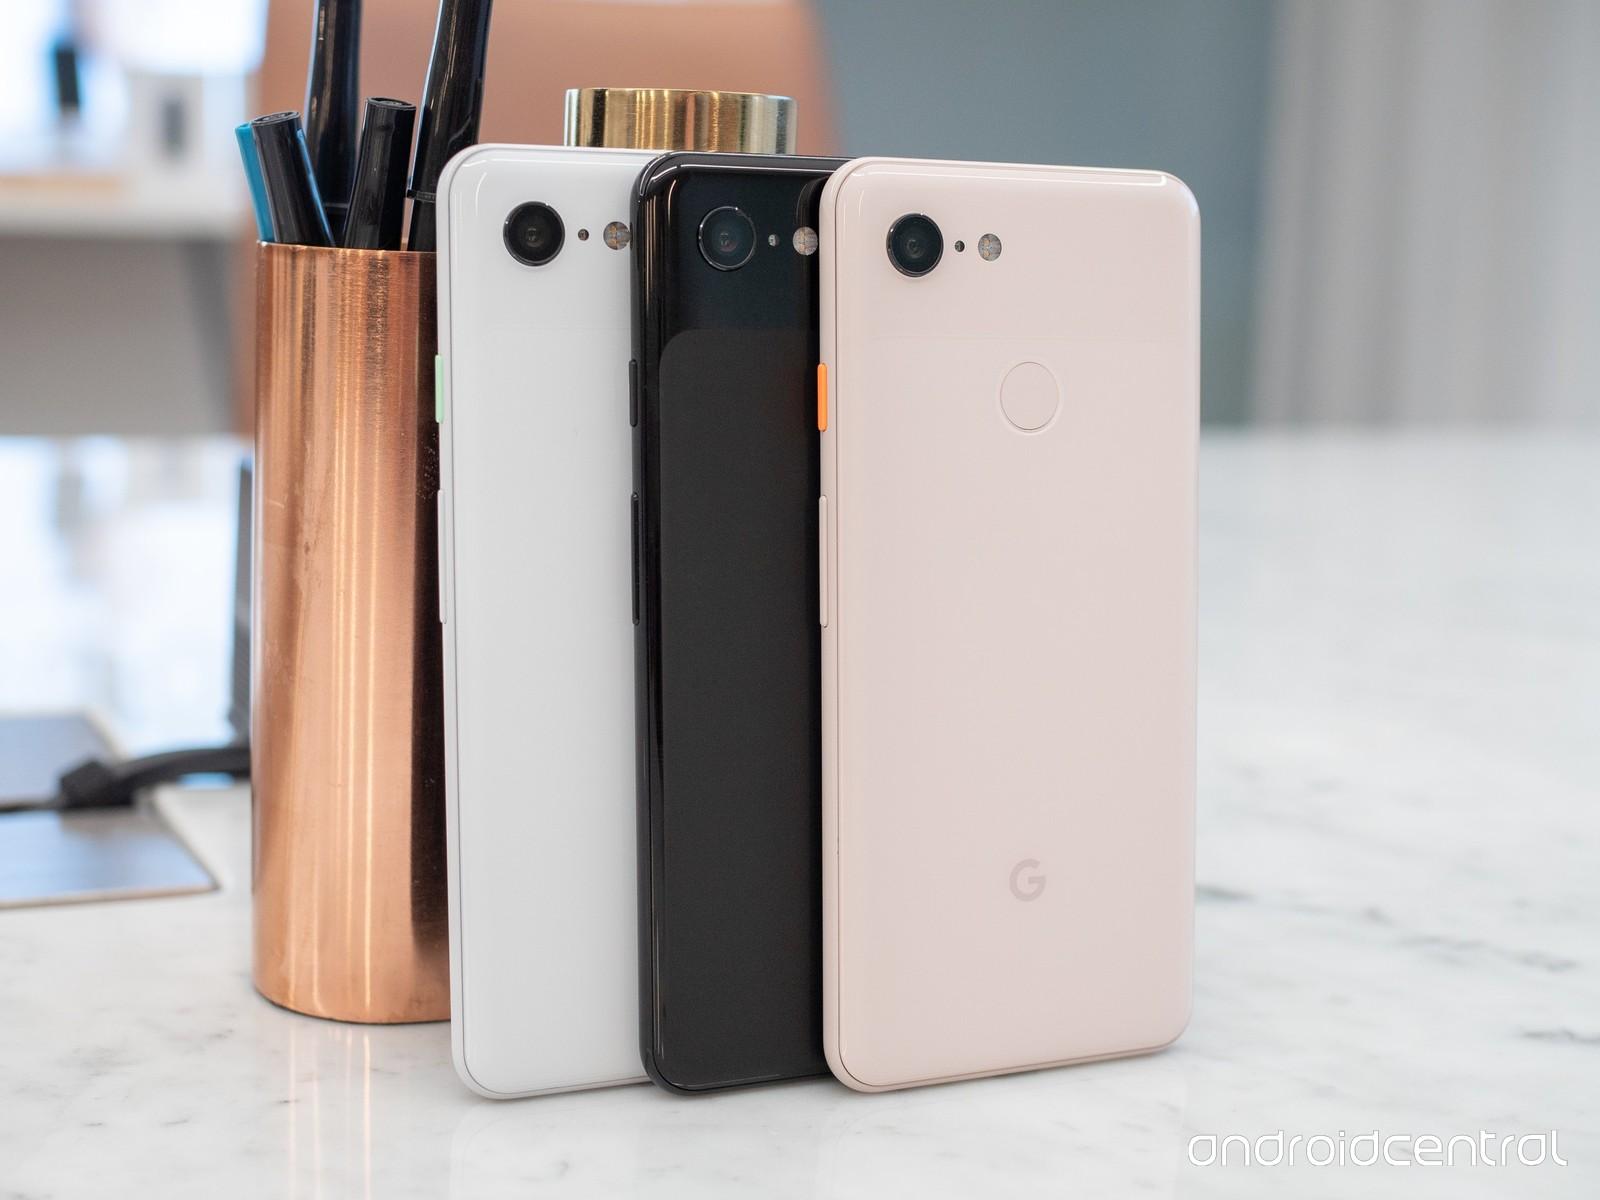 Fix Google Pixel 3/ Pixel 3 XL Mobile Data Not Working